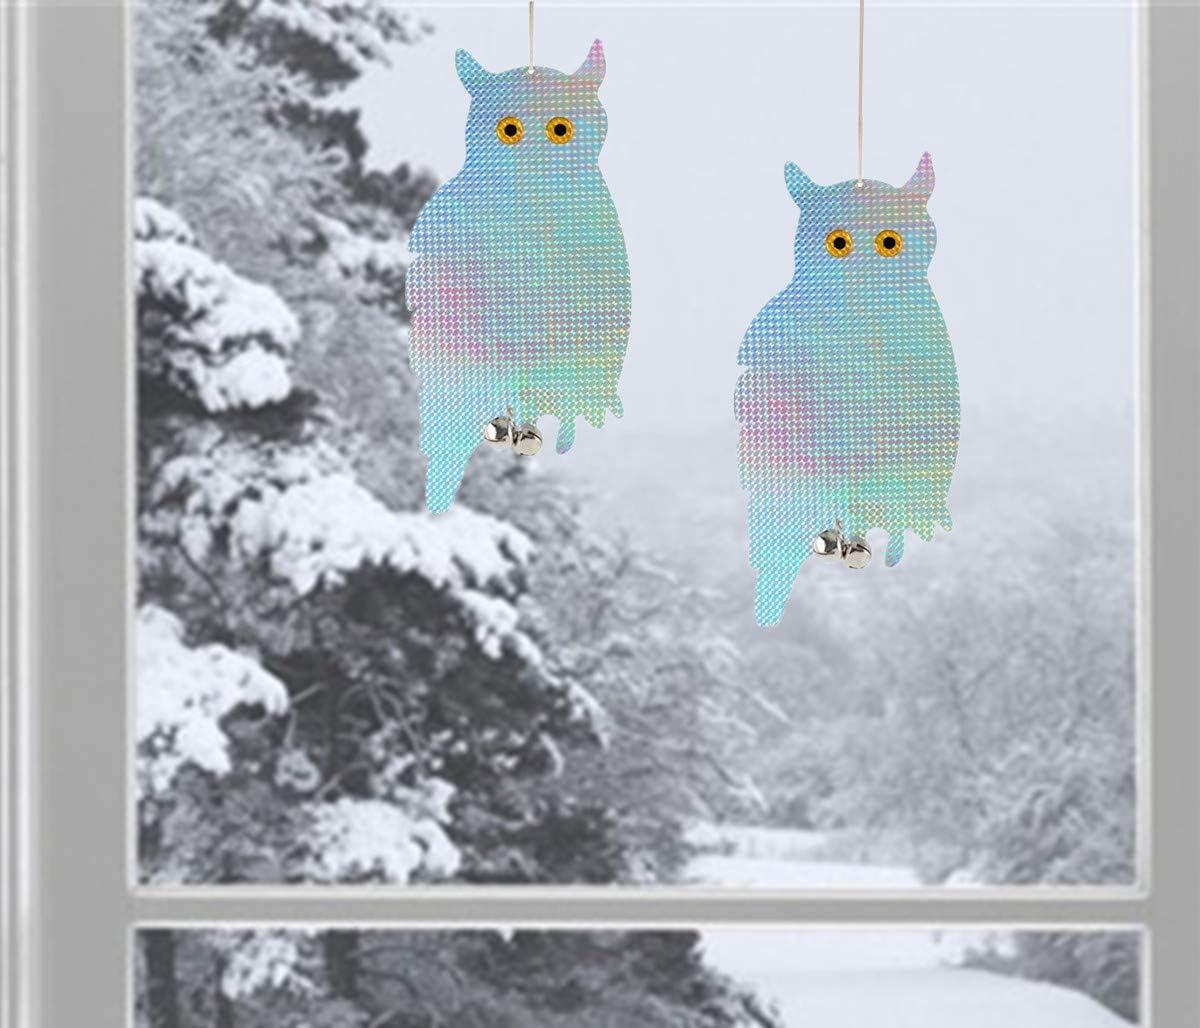 Anti-Collision Window Bird Owl Repellent Devices Decor - Laser Hanging Holographic Reflective Scare Owl Deterrent, Prevent Bird Strikes, 2 Pcs